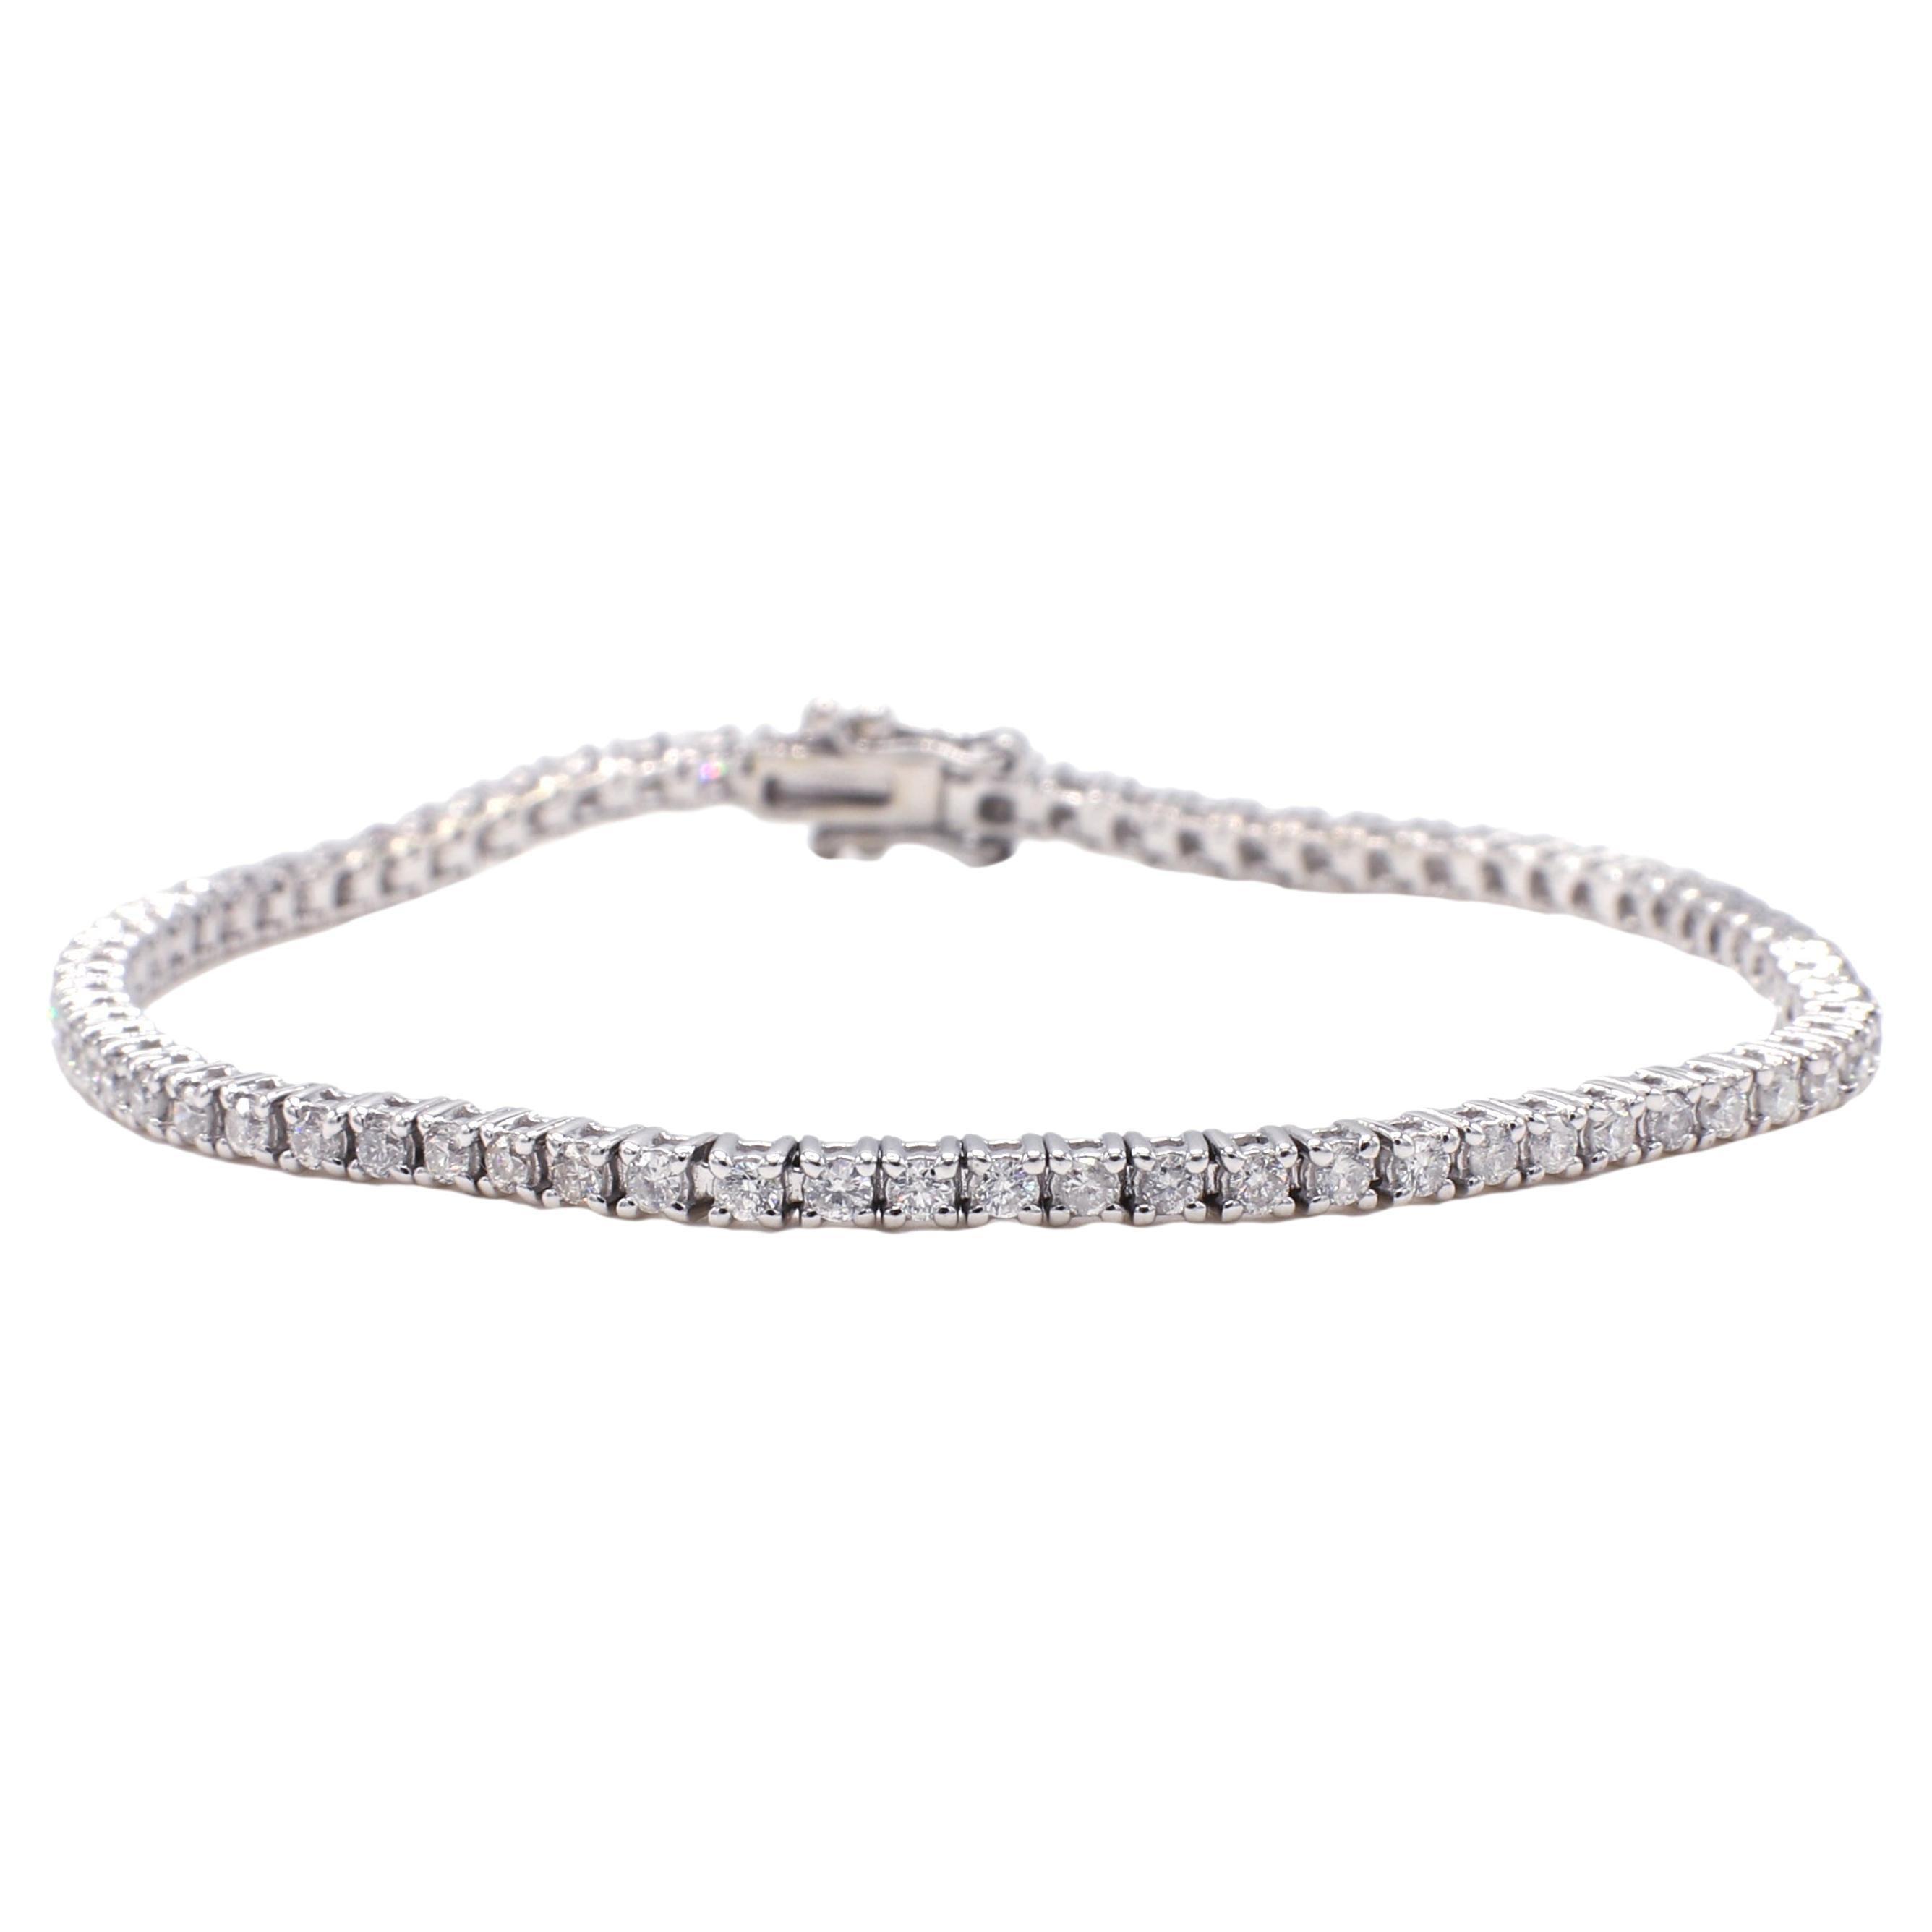 18 Karat White Gold 1.50 Carat Diamond Line Tennis Bracelet